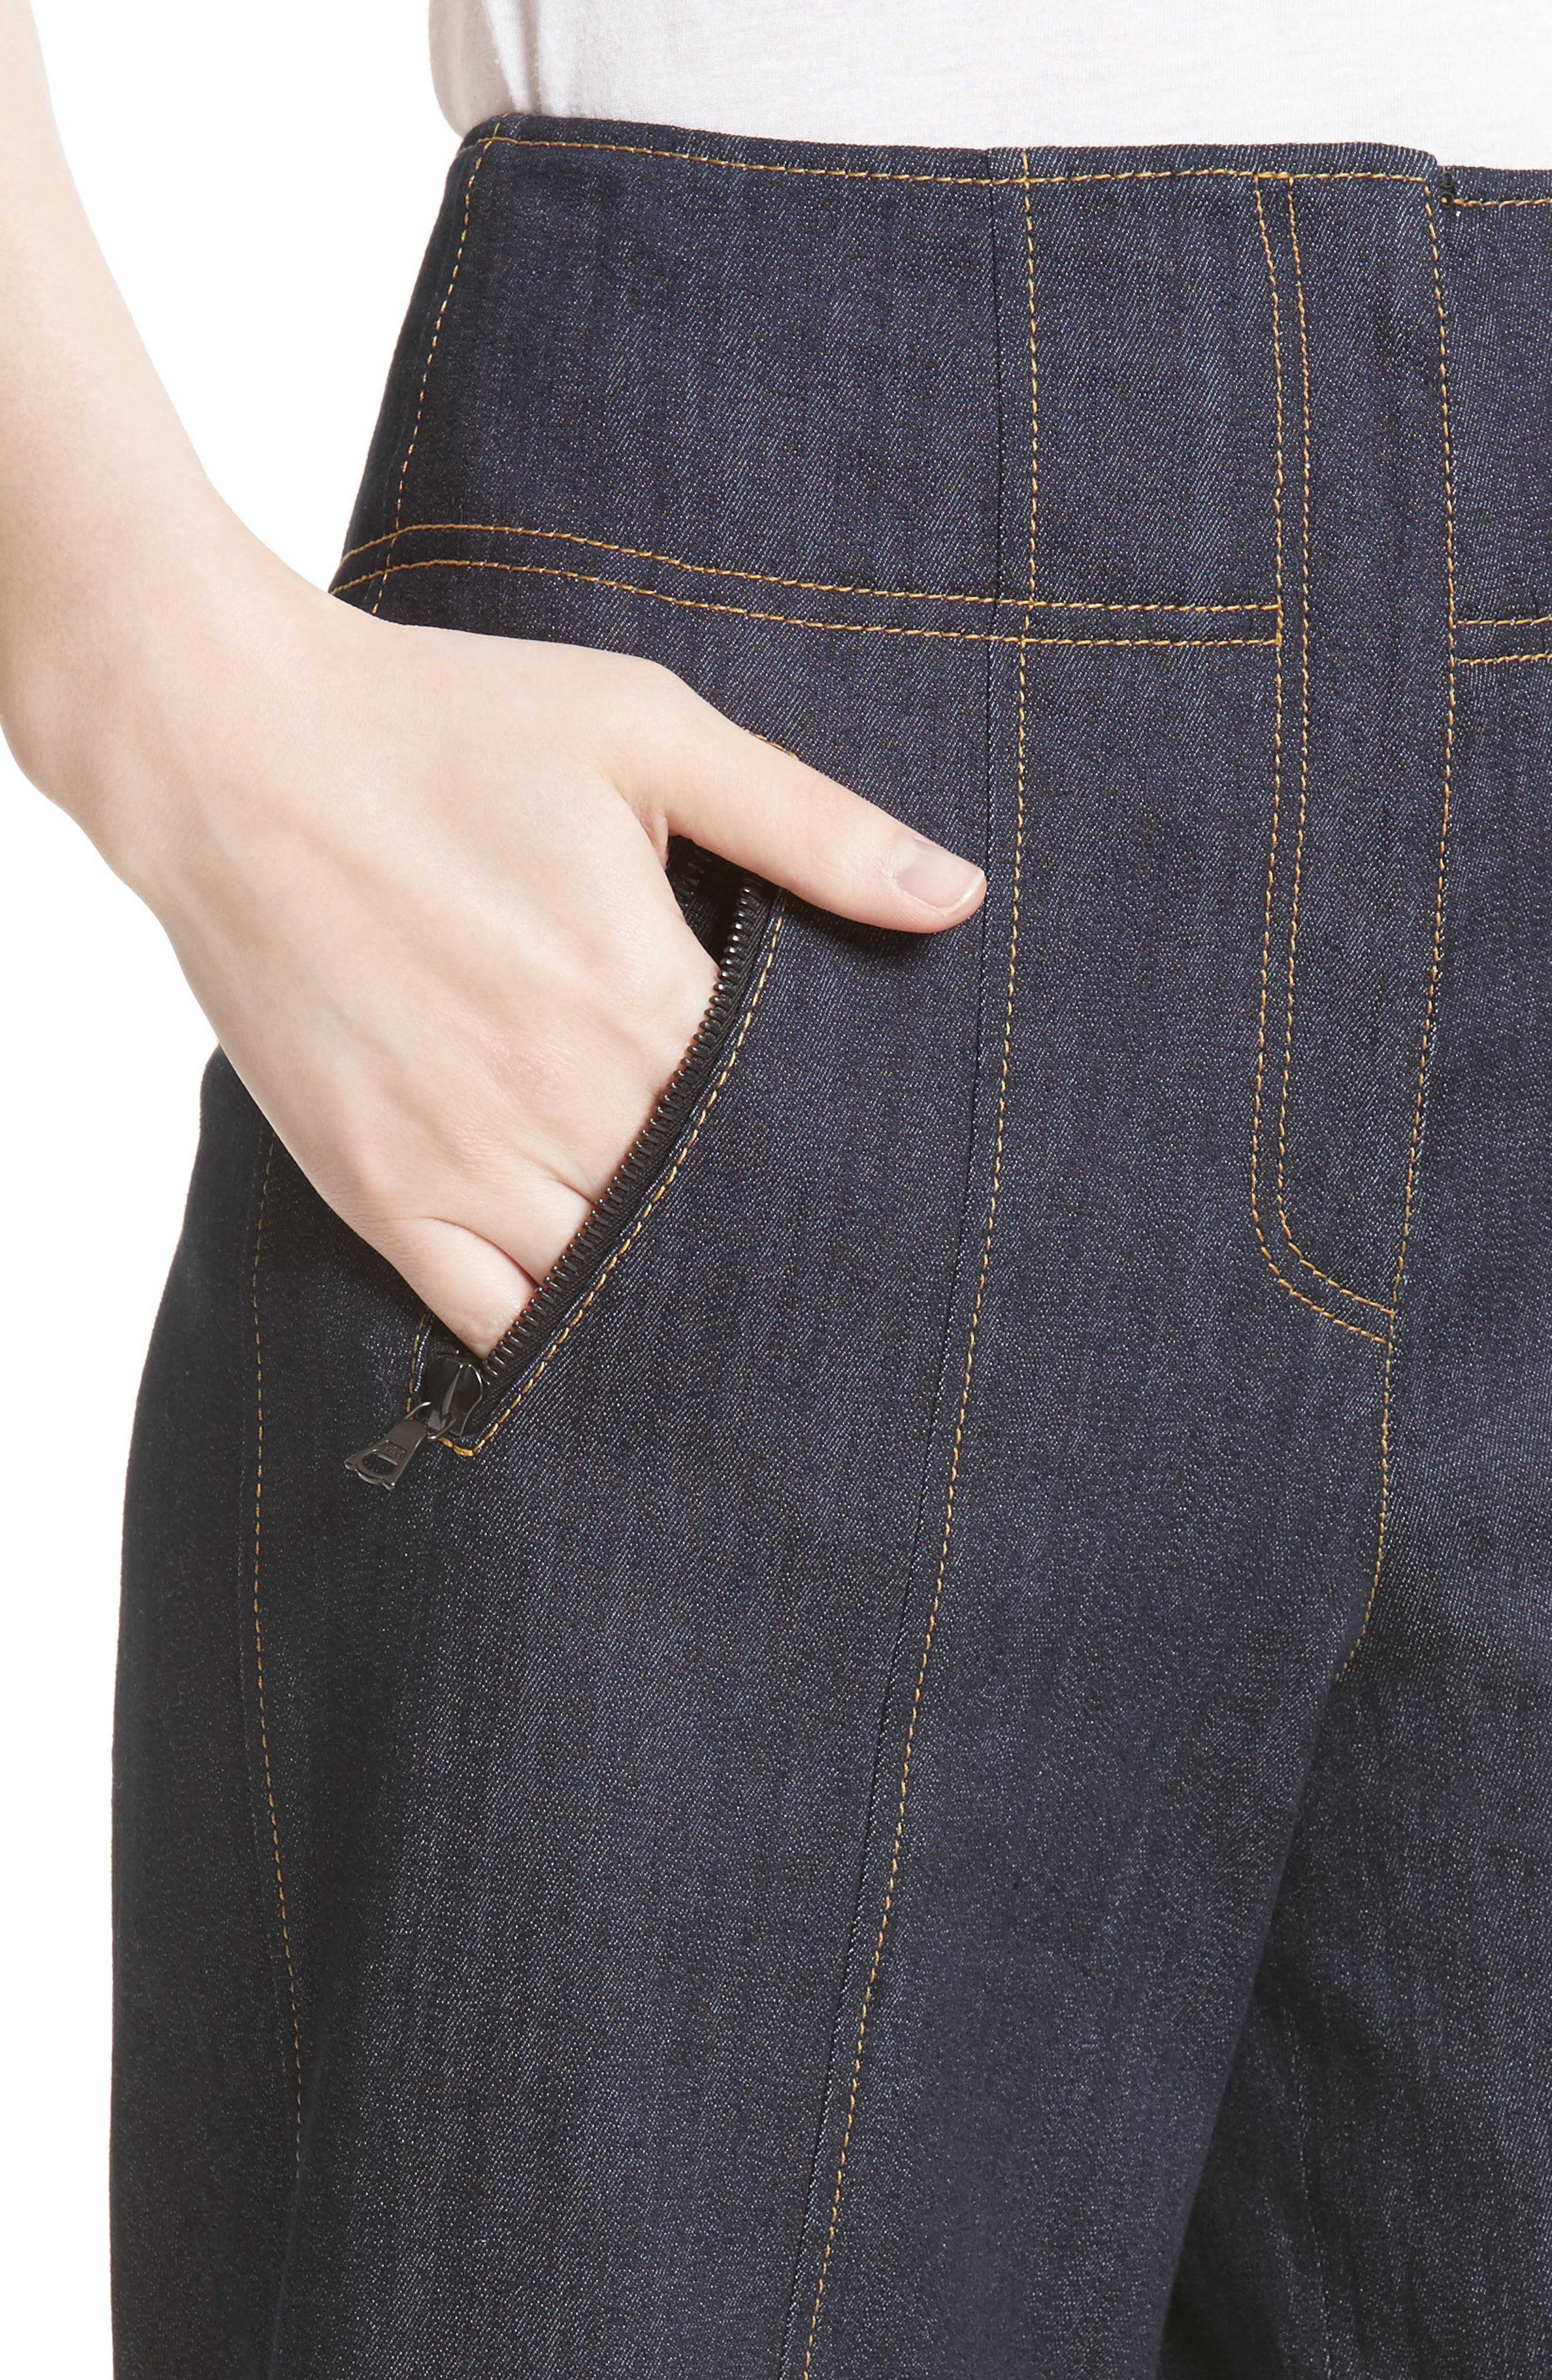 Marla Cuff Jeans,                             Alternate thumbnail 5, color,                             Indigo